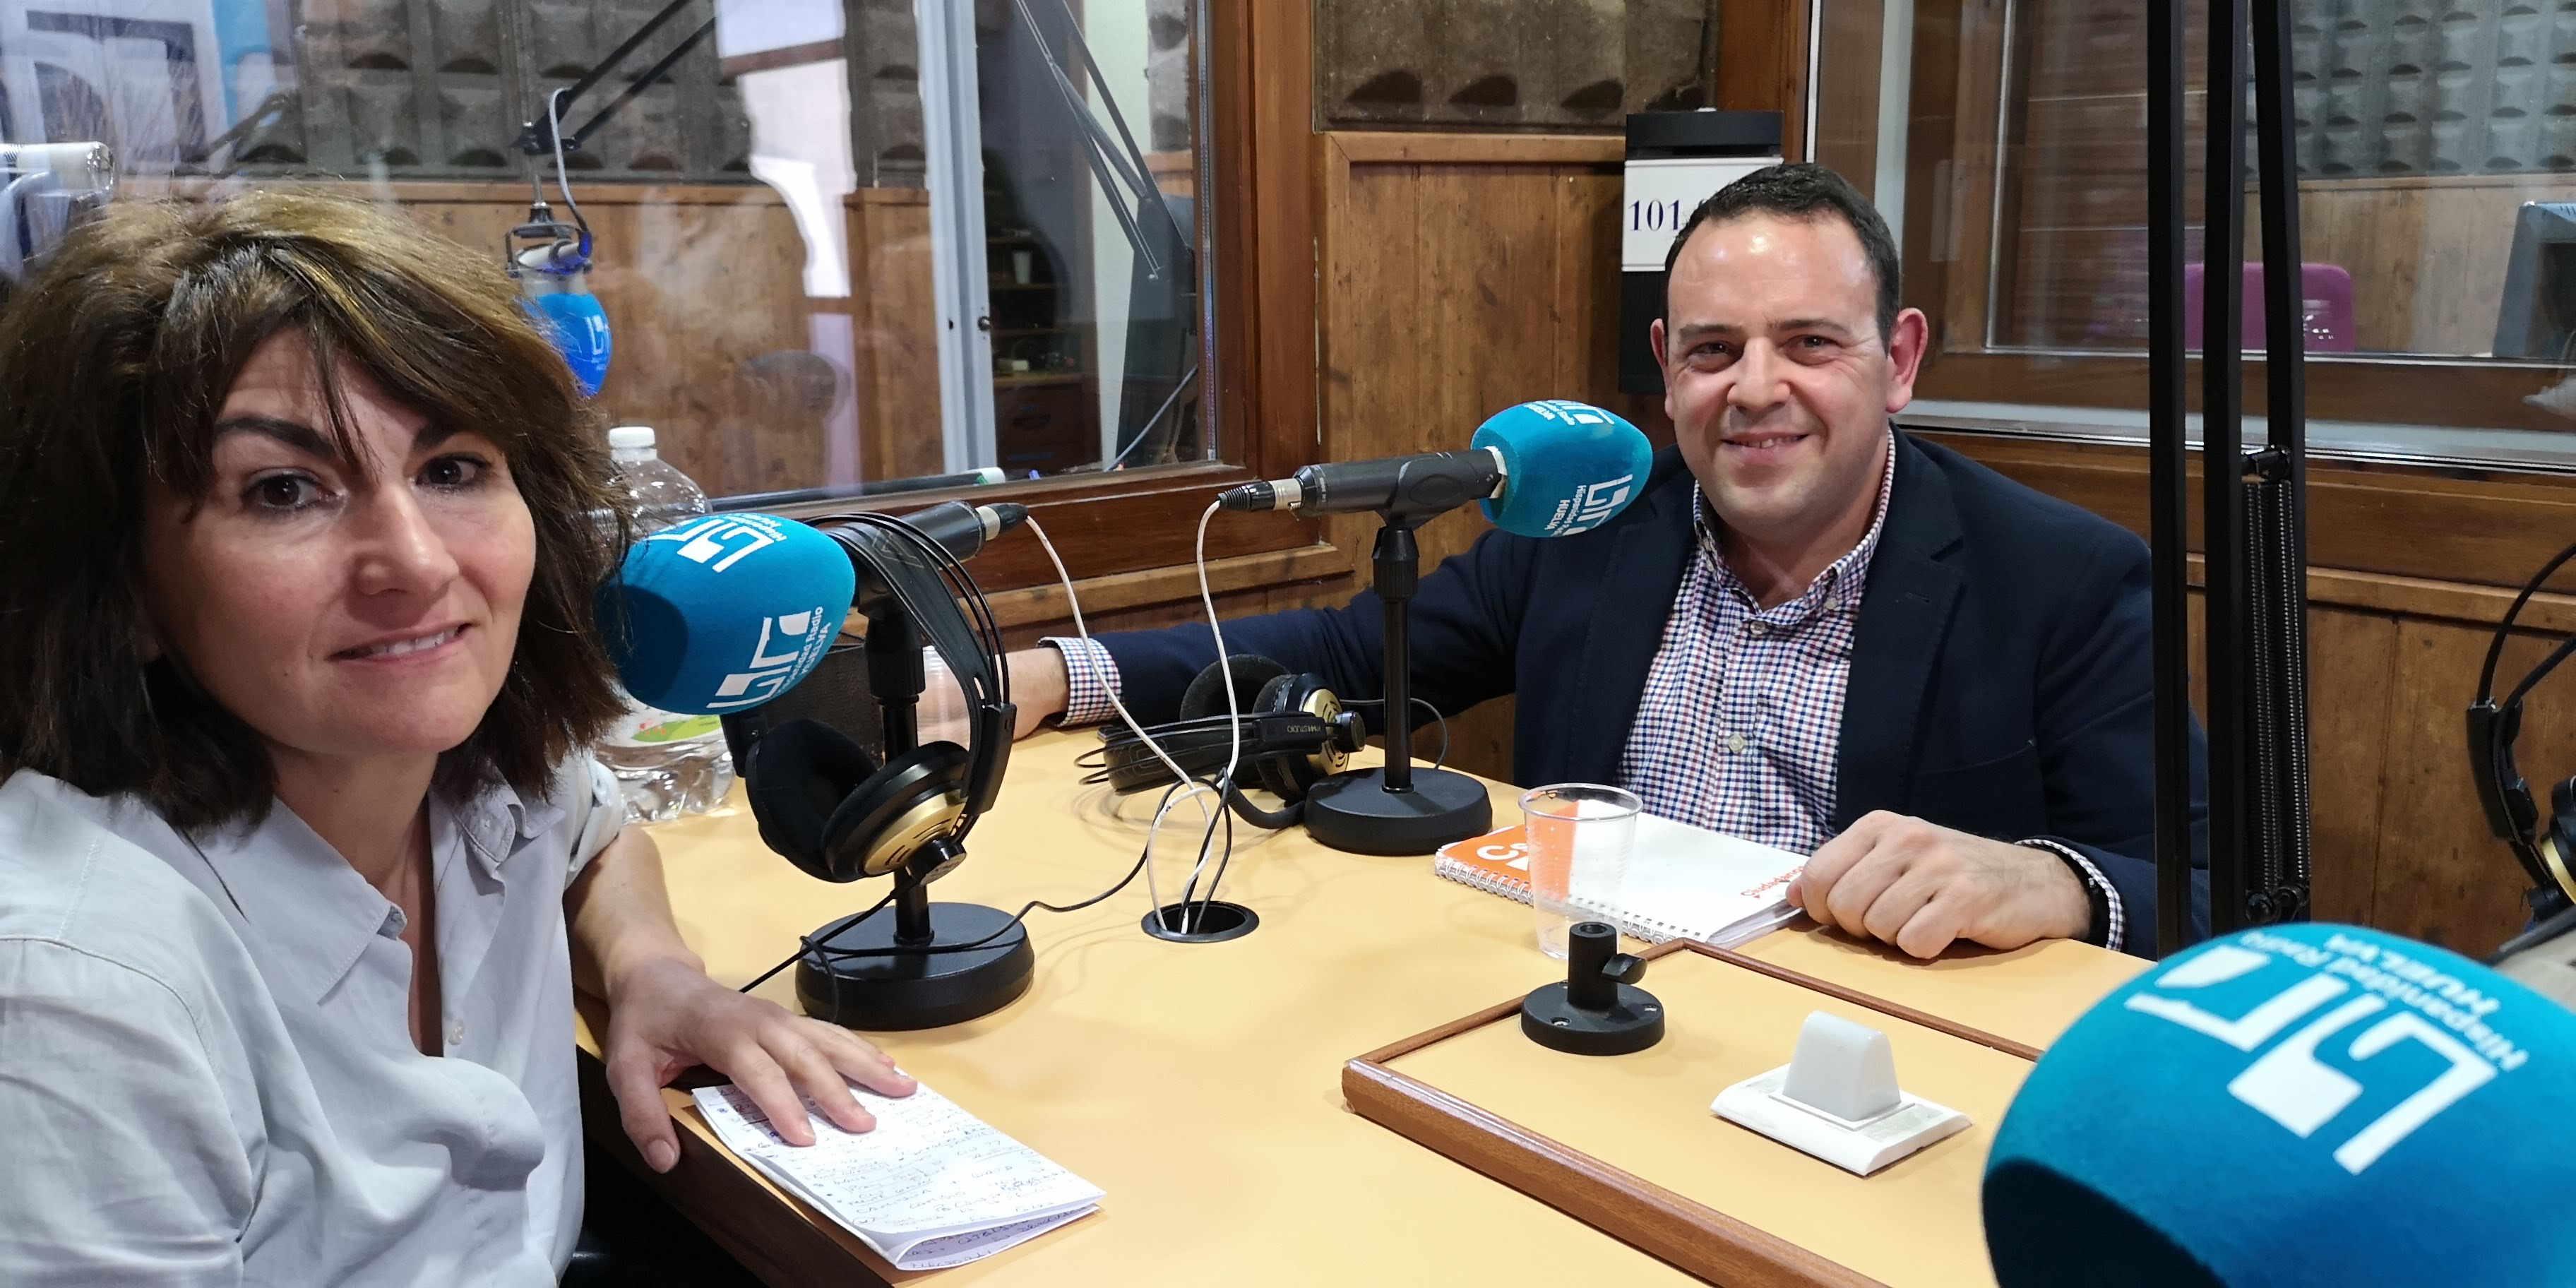 Queremos Saber 16-10-2019 Carlos Hermoso, Candidato a Diputado de Ciudadanos por Huelva.